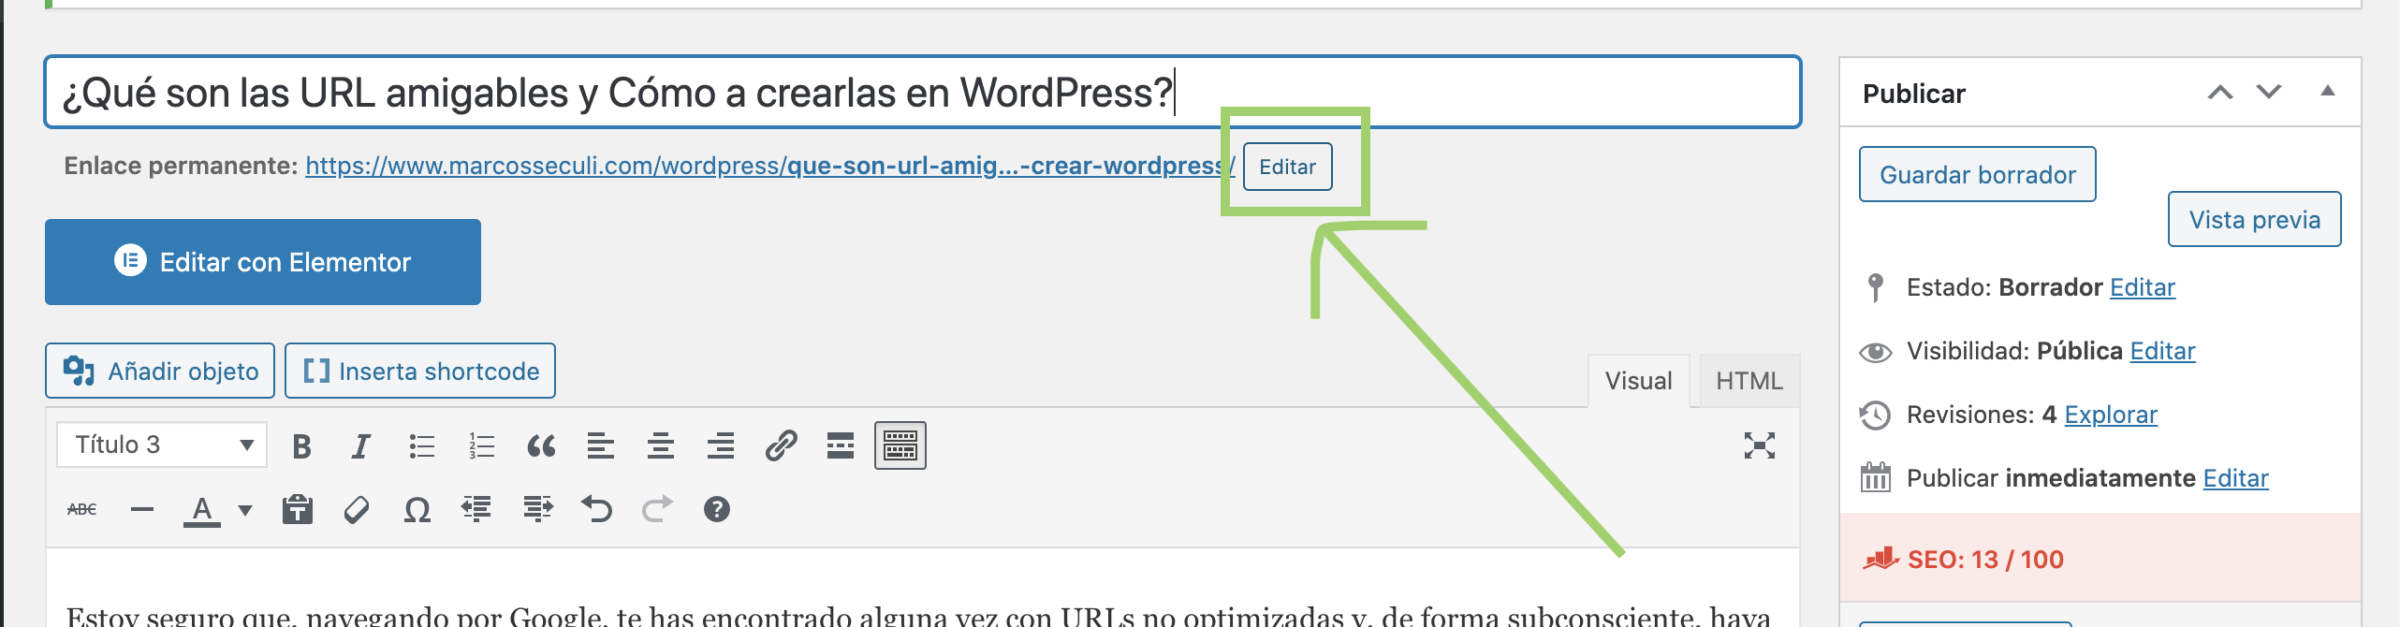 Crear o editar URL amigable WordPress